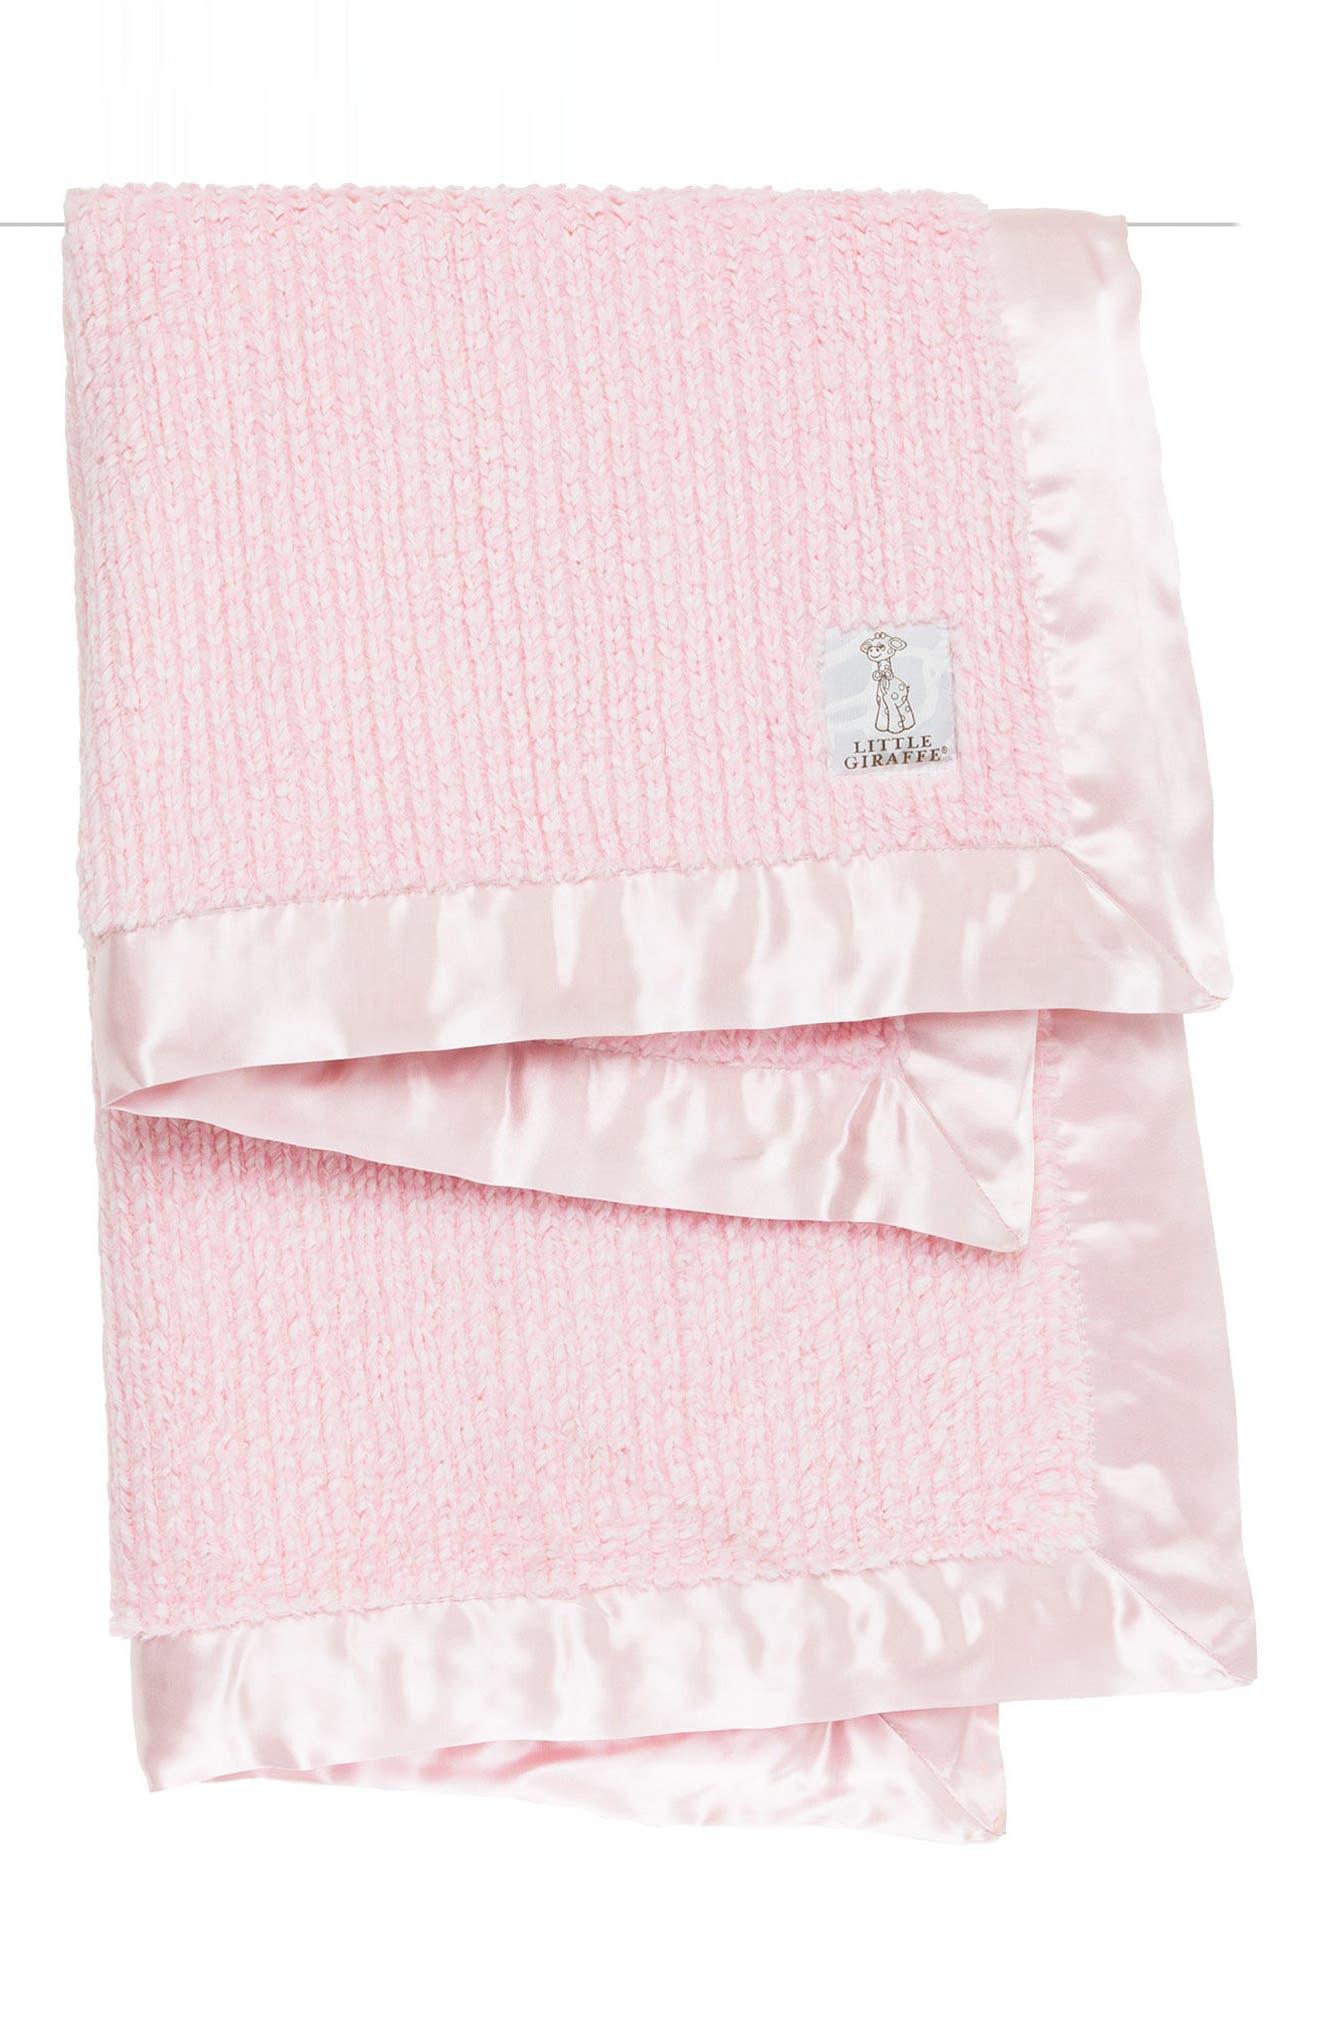 LITTLE GIRAFFE Luxe Herringbone Blanket, Main, color, PINK